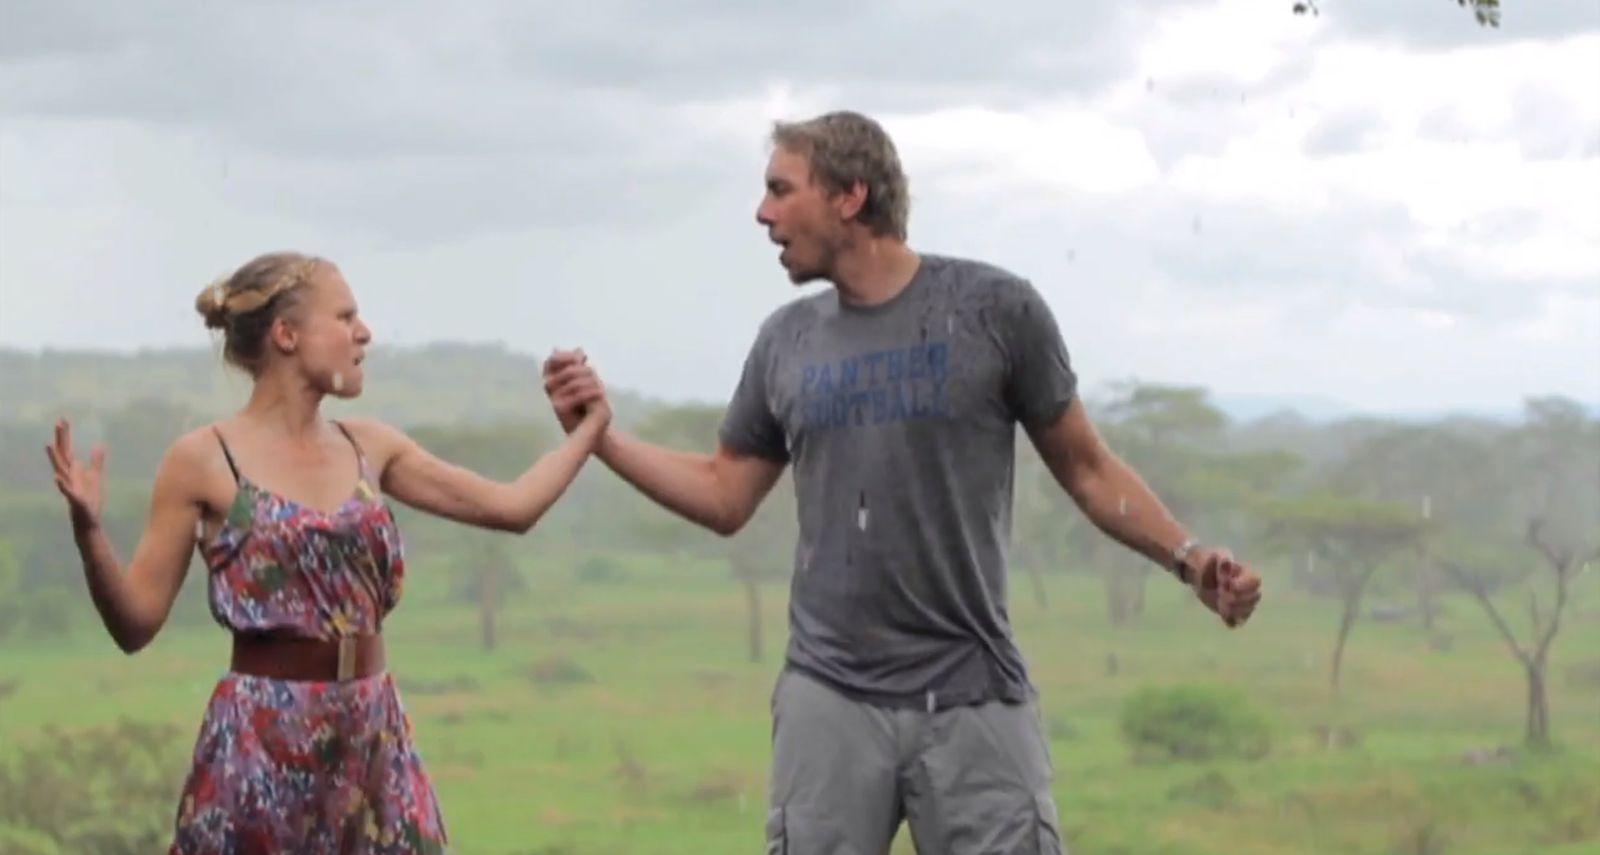 NUR ALS ZITAT YouTube/ Kristen Bell und Dan Shepard